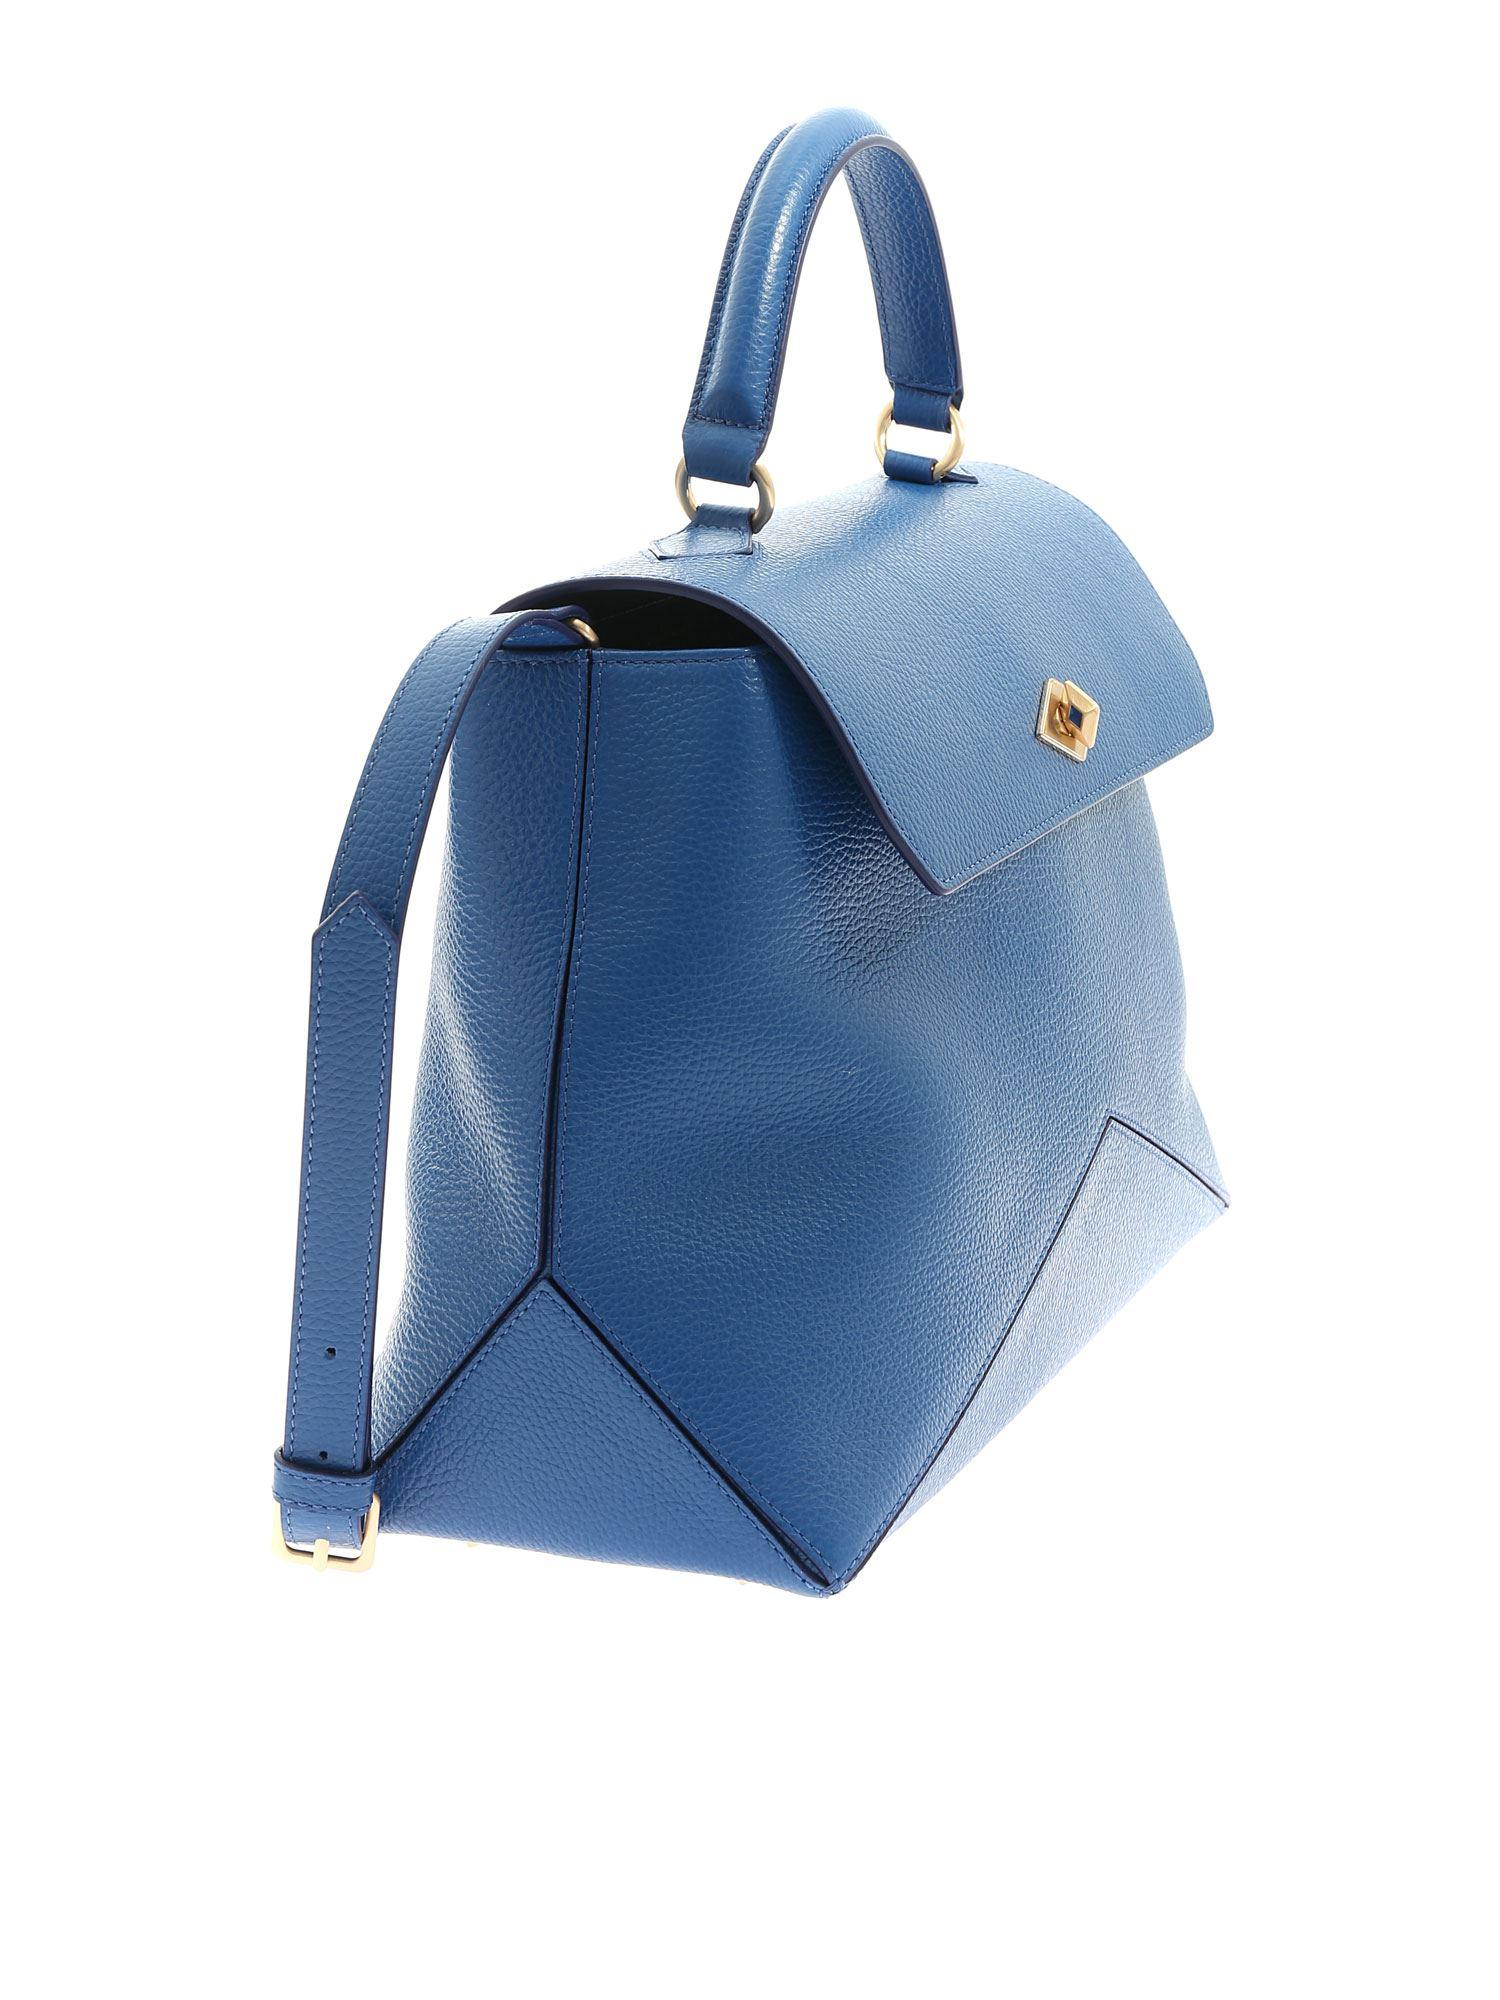 9fe2c8b245 Ballantyne Diamond Bag In Blue Hammered Leather in Blue - Lyst